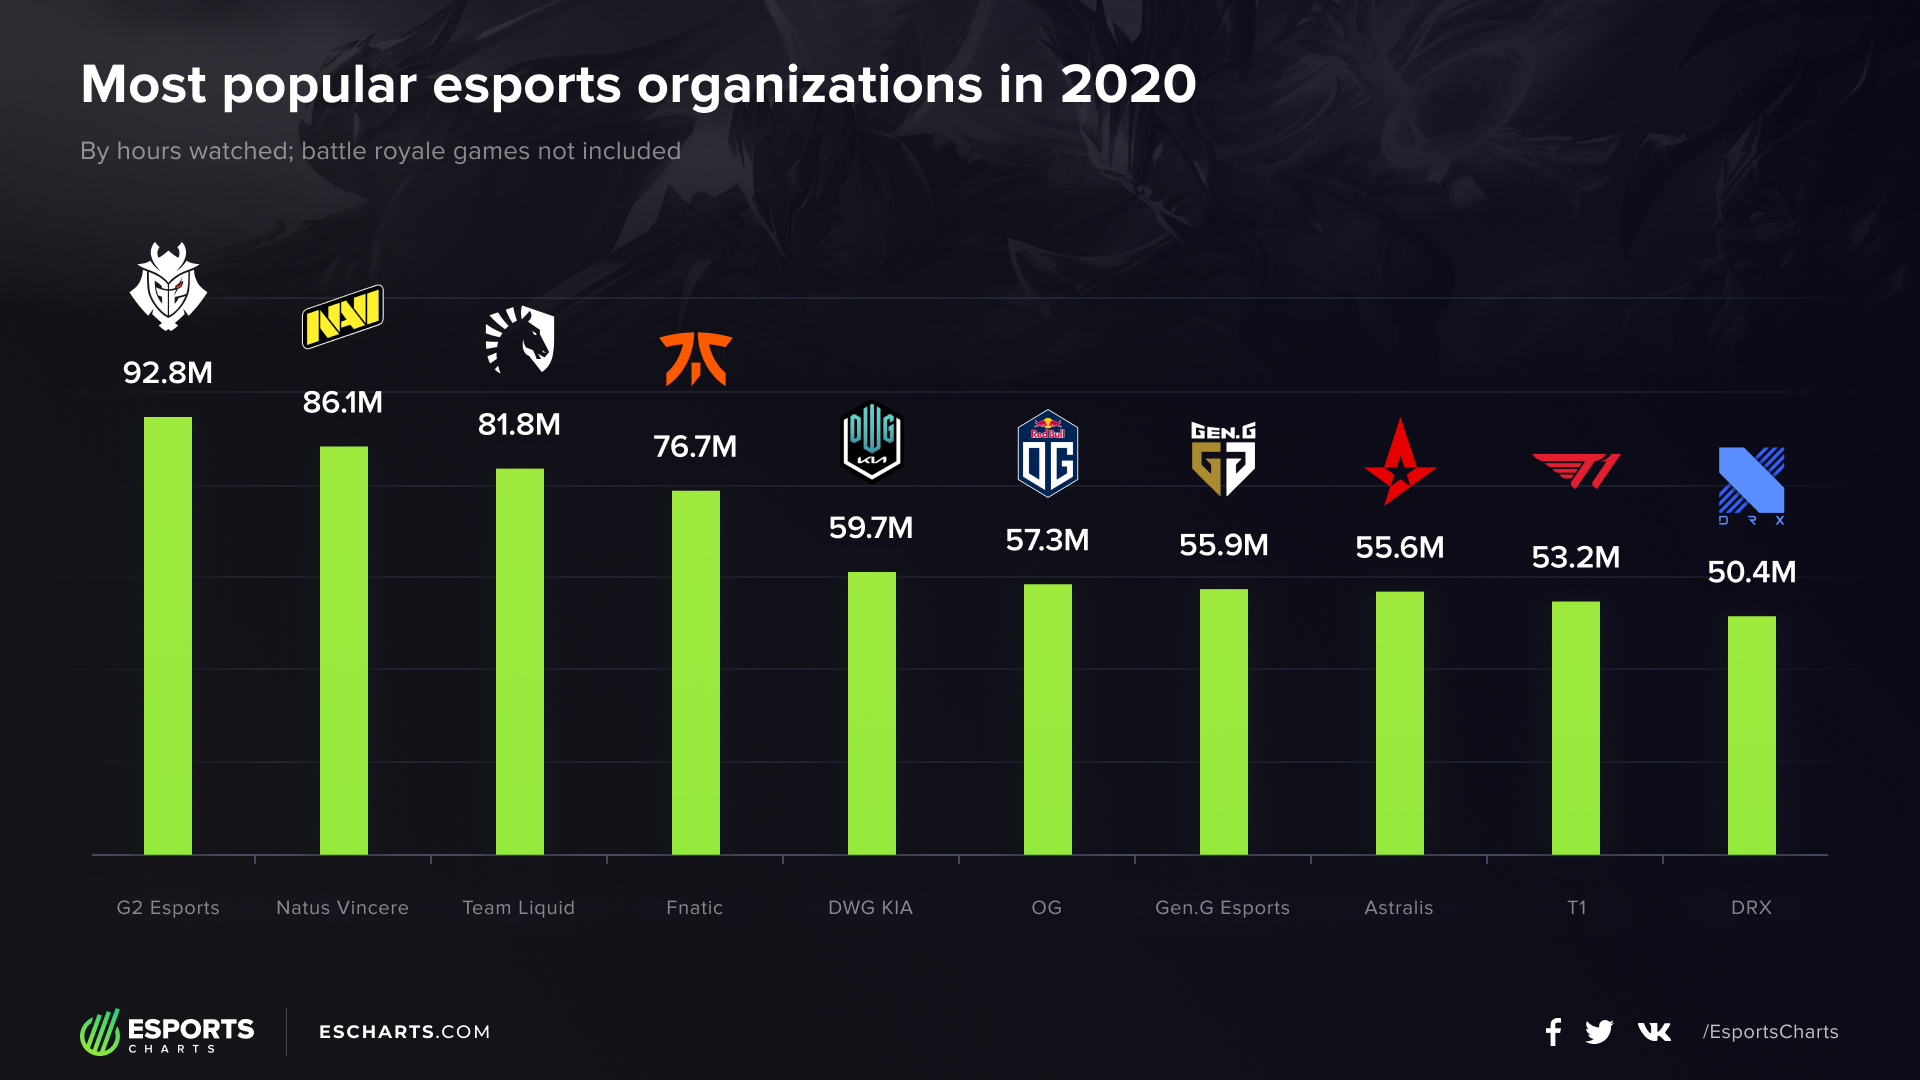 Most popular esports organizations in 2020